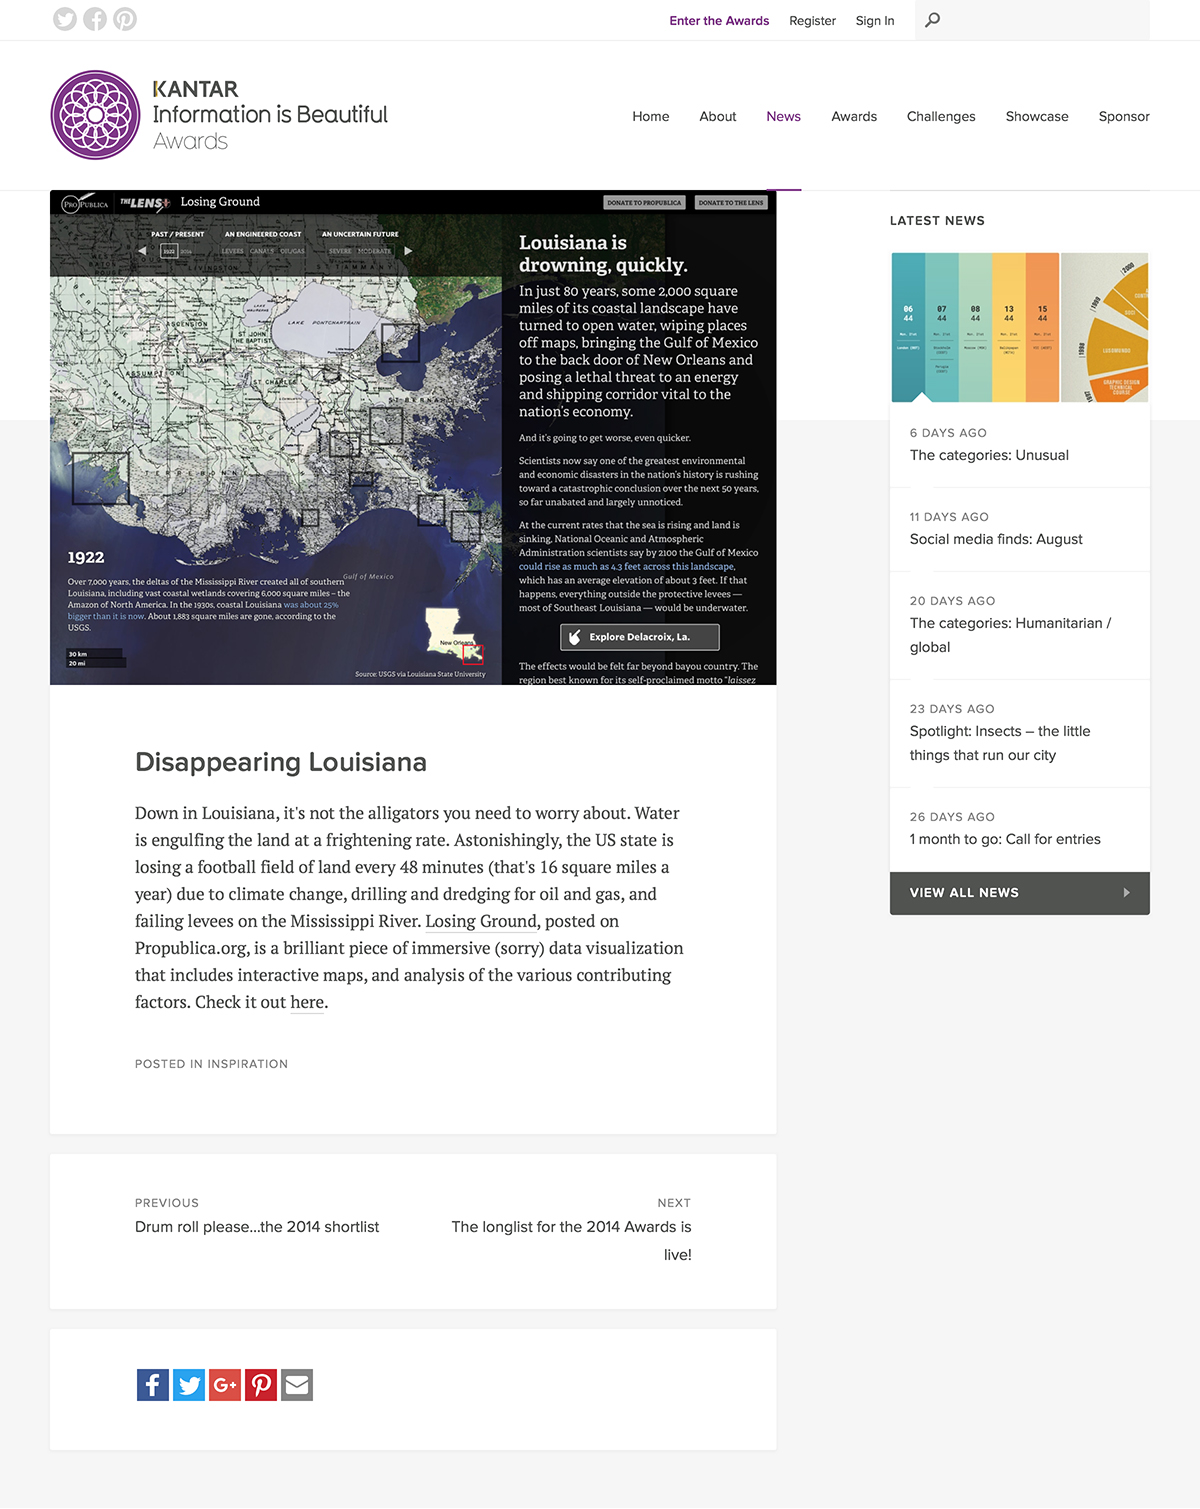 Disappearing Louisiana blog post web res copy.jpg